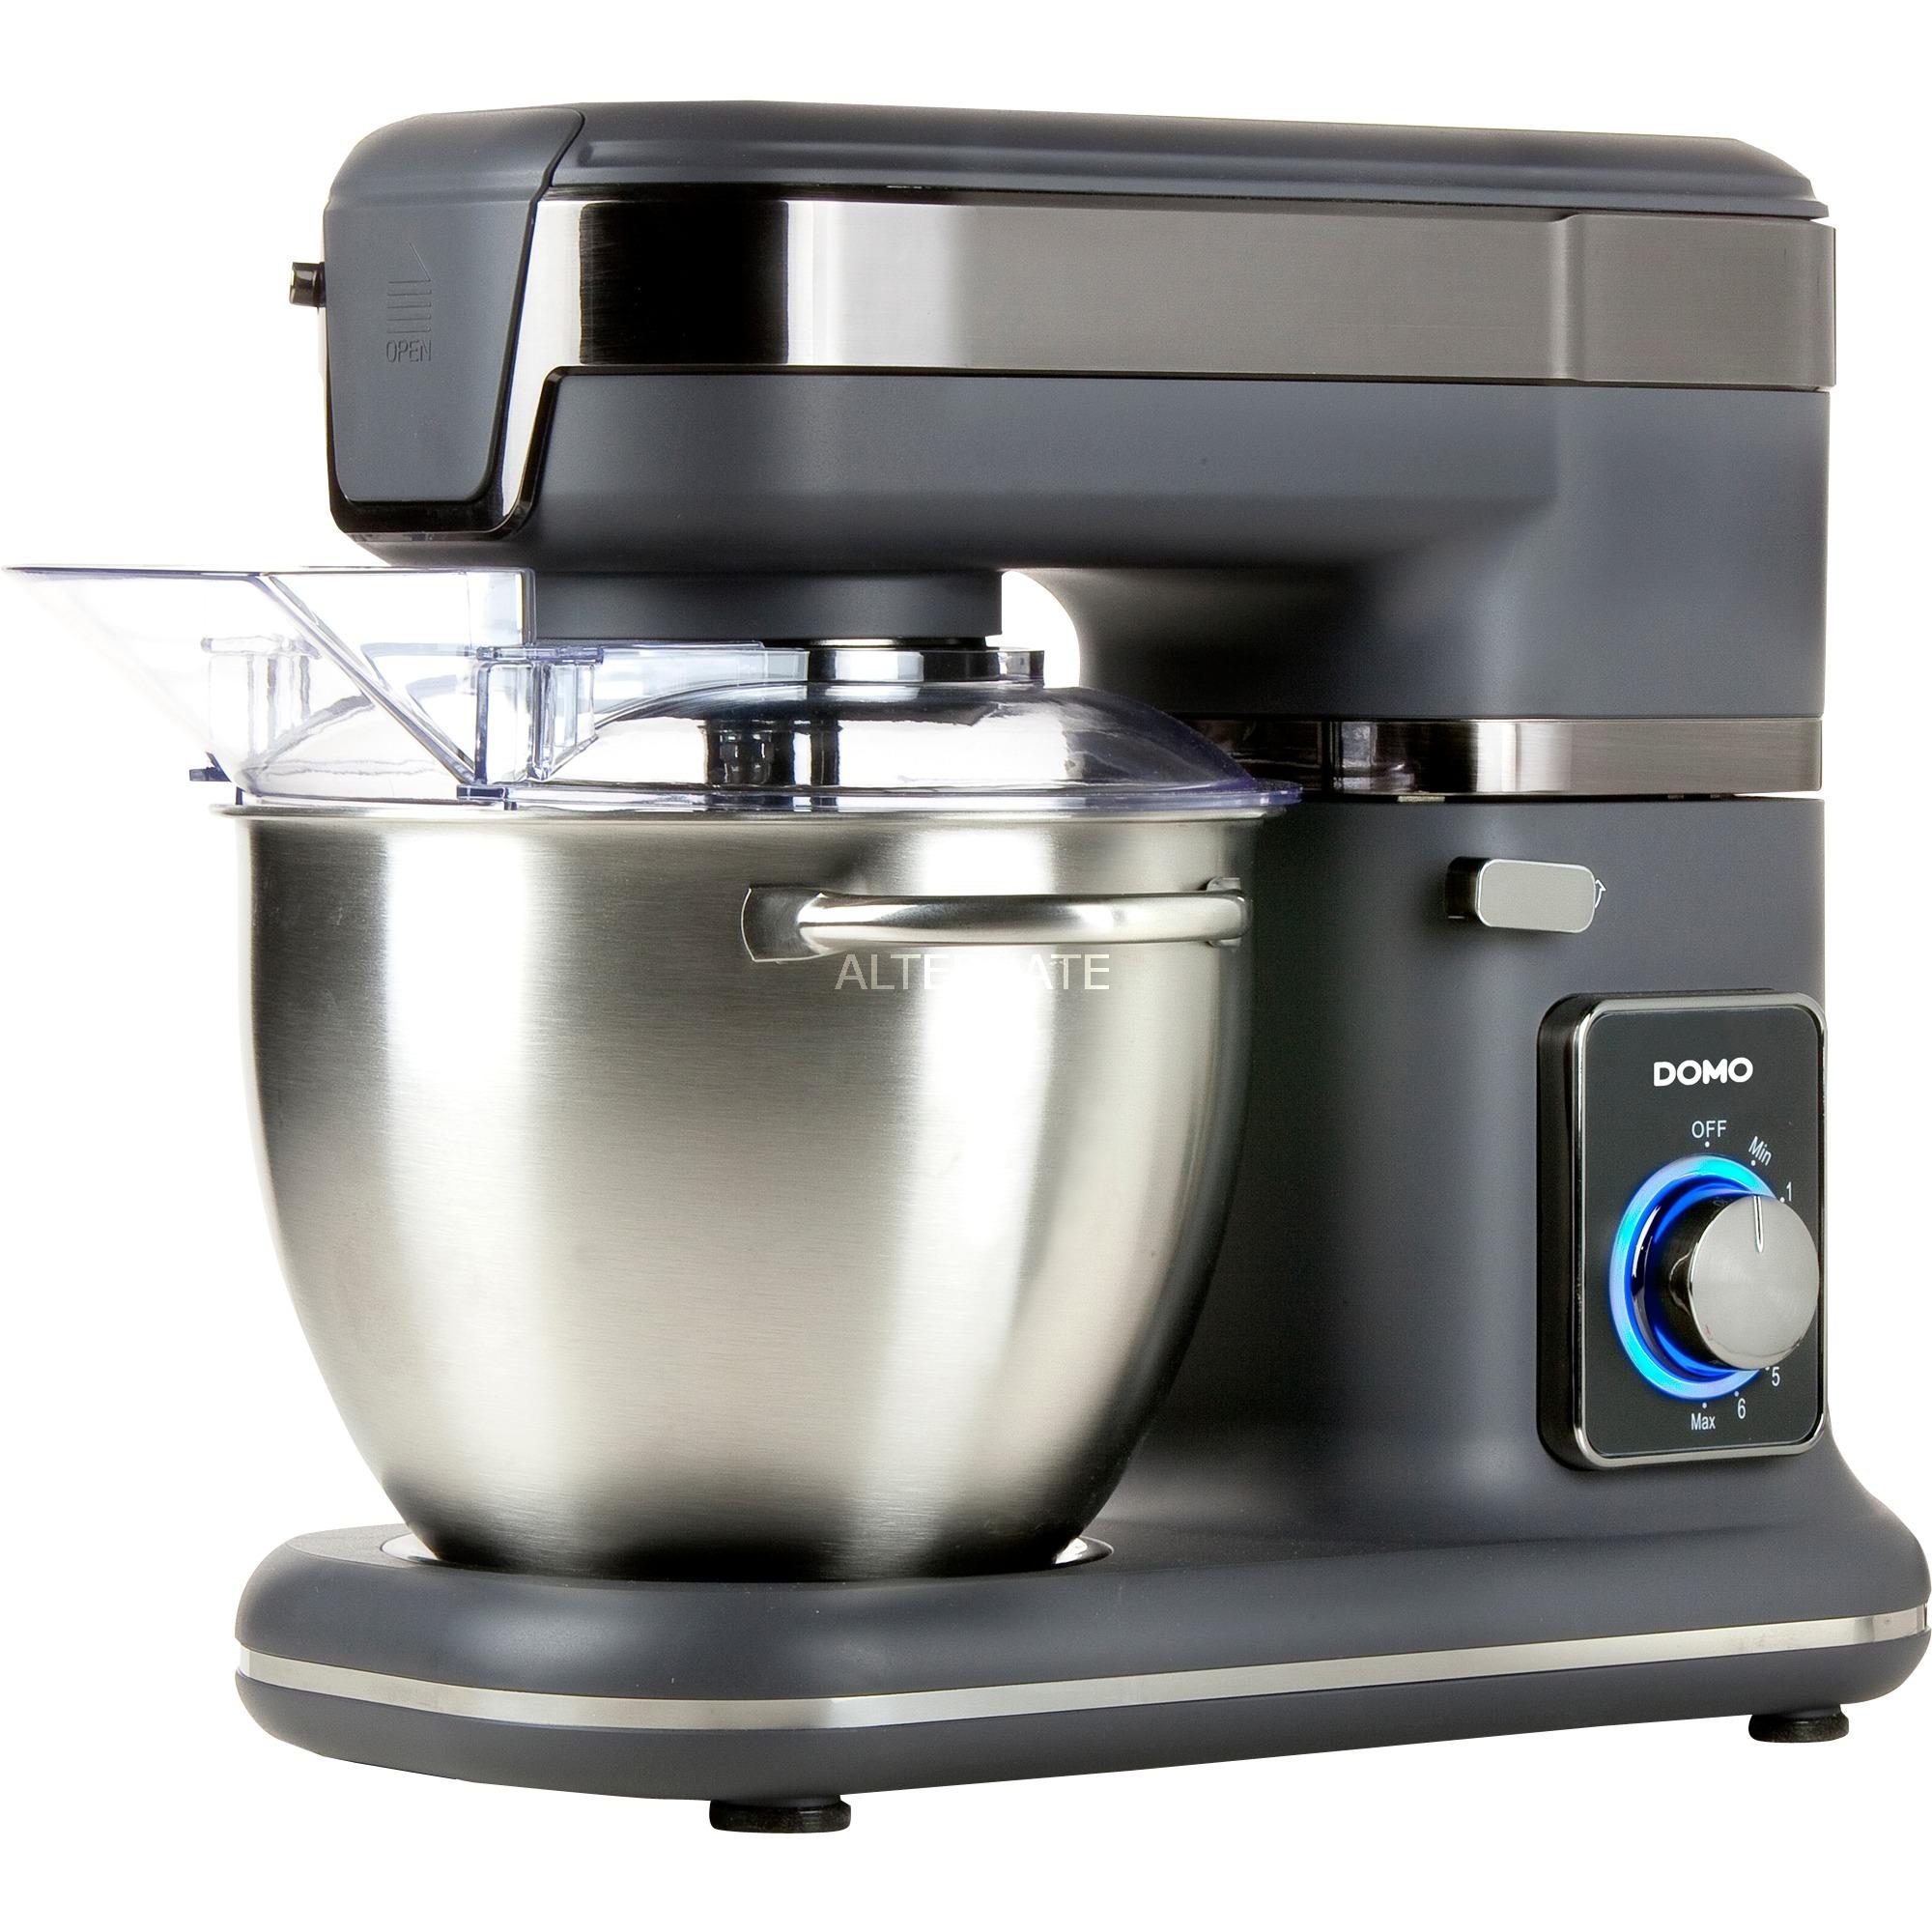 DO9070KR 1000W 4.5L Acero inoxidable robot de cocina